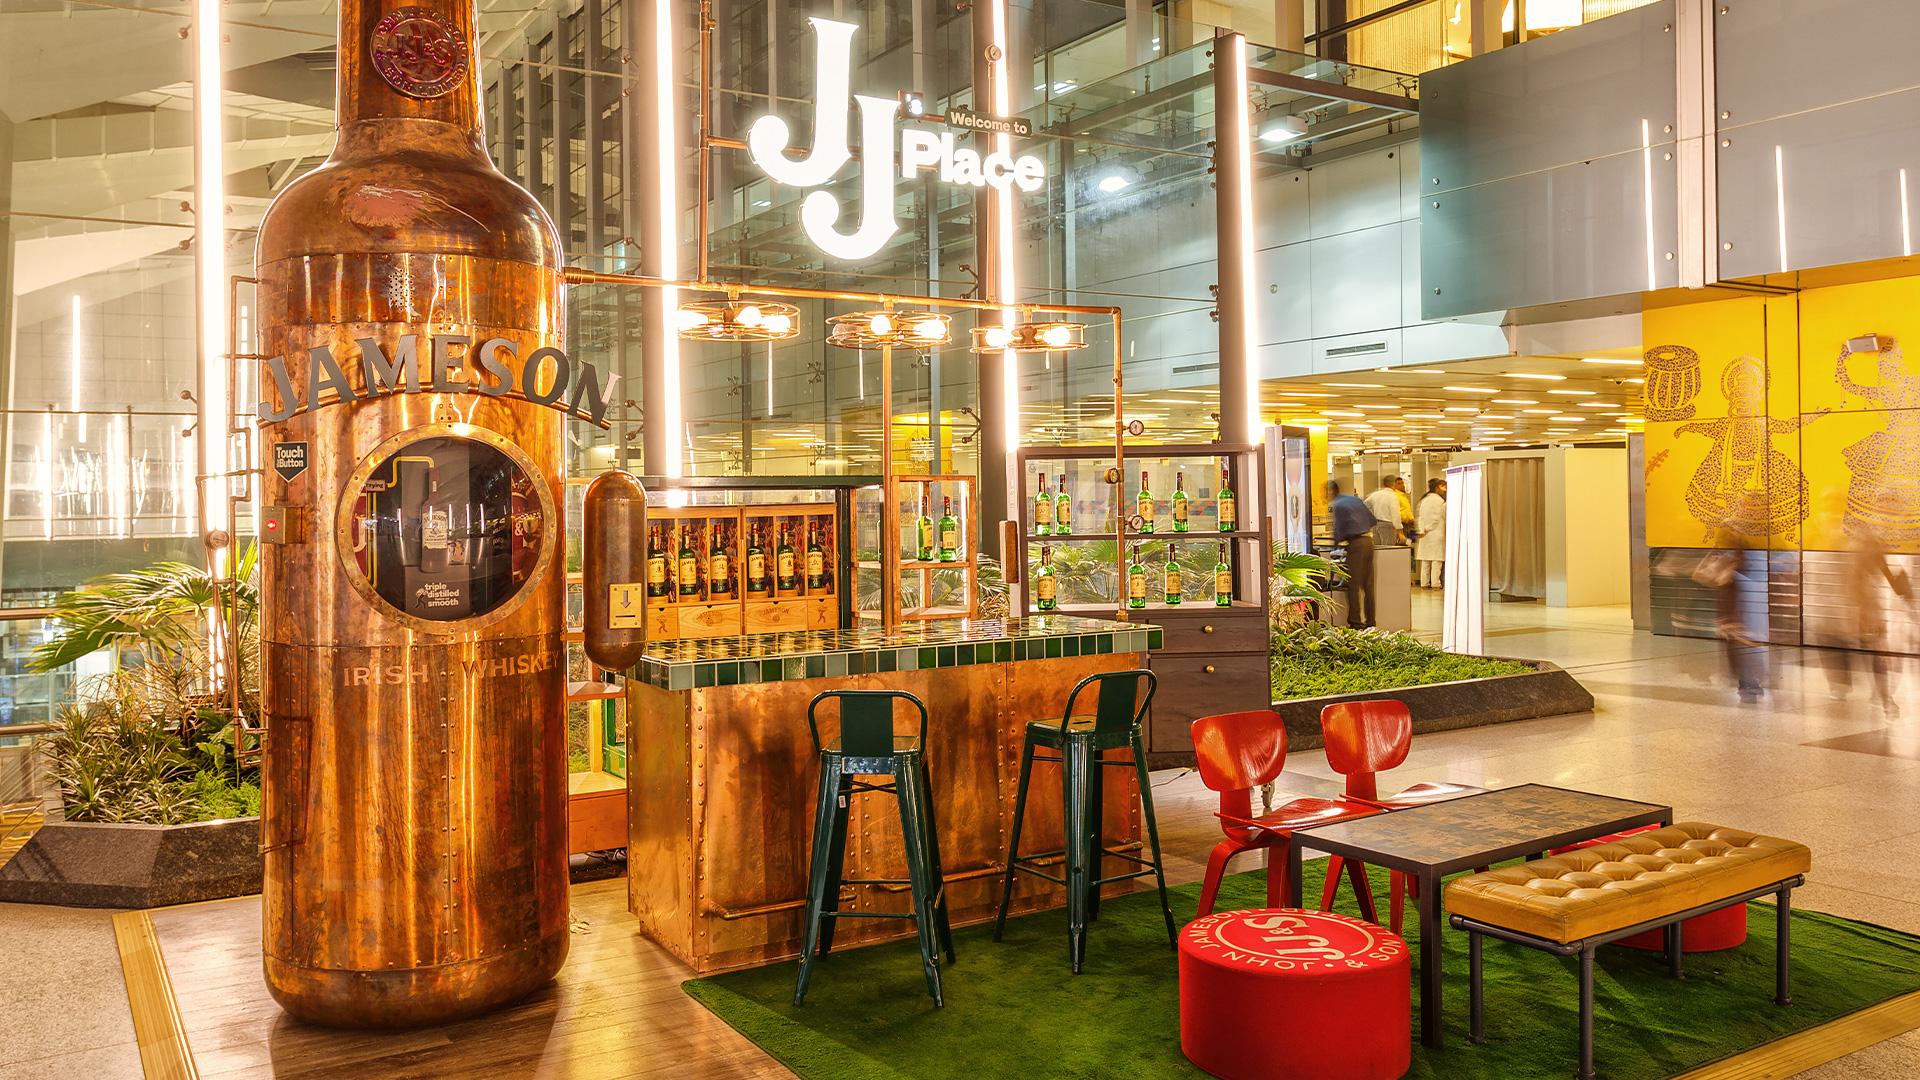 LIGANOVA | Jameson | POS Campaign – JJ's Place